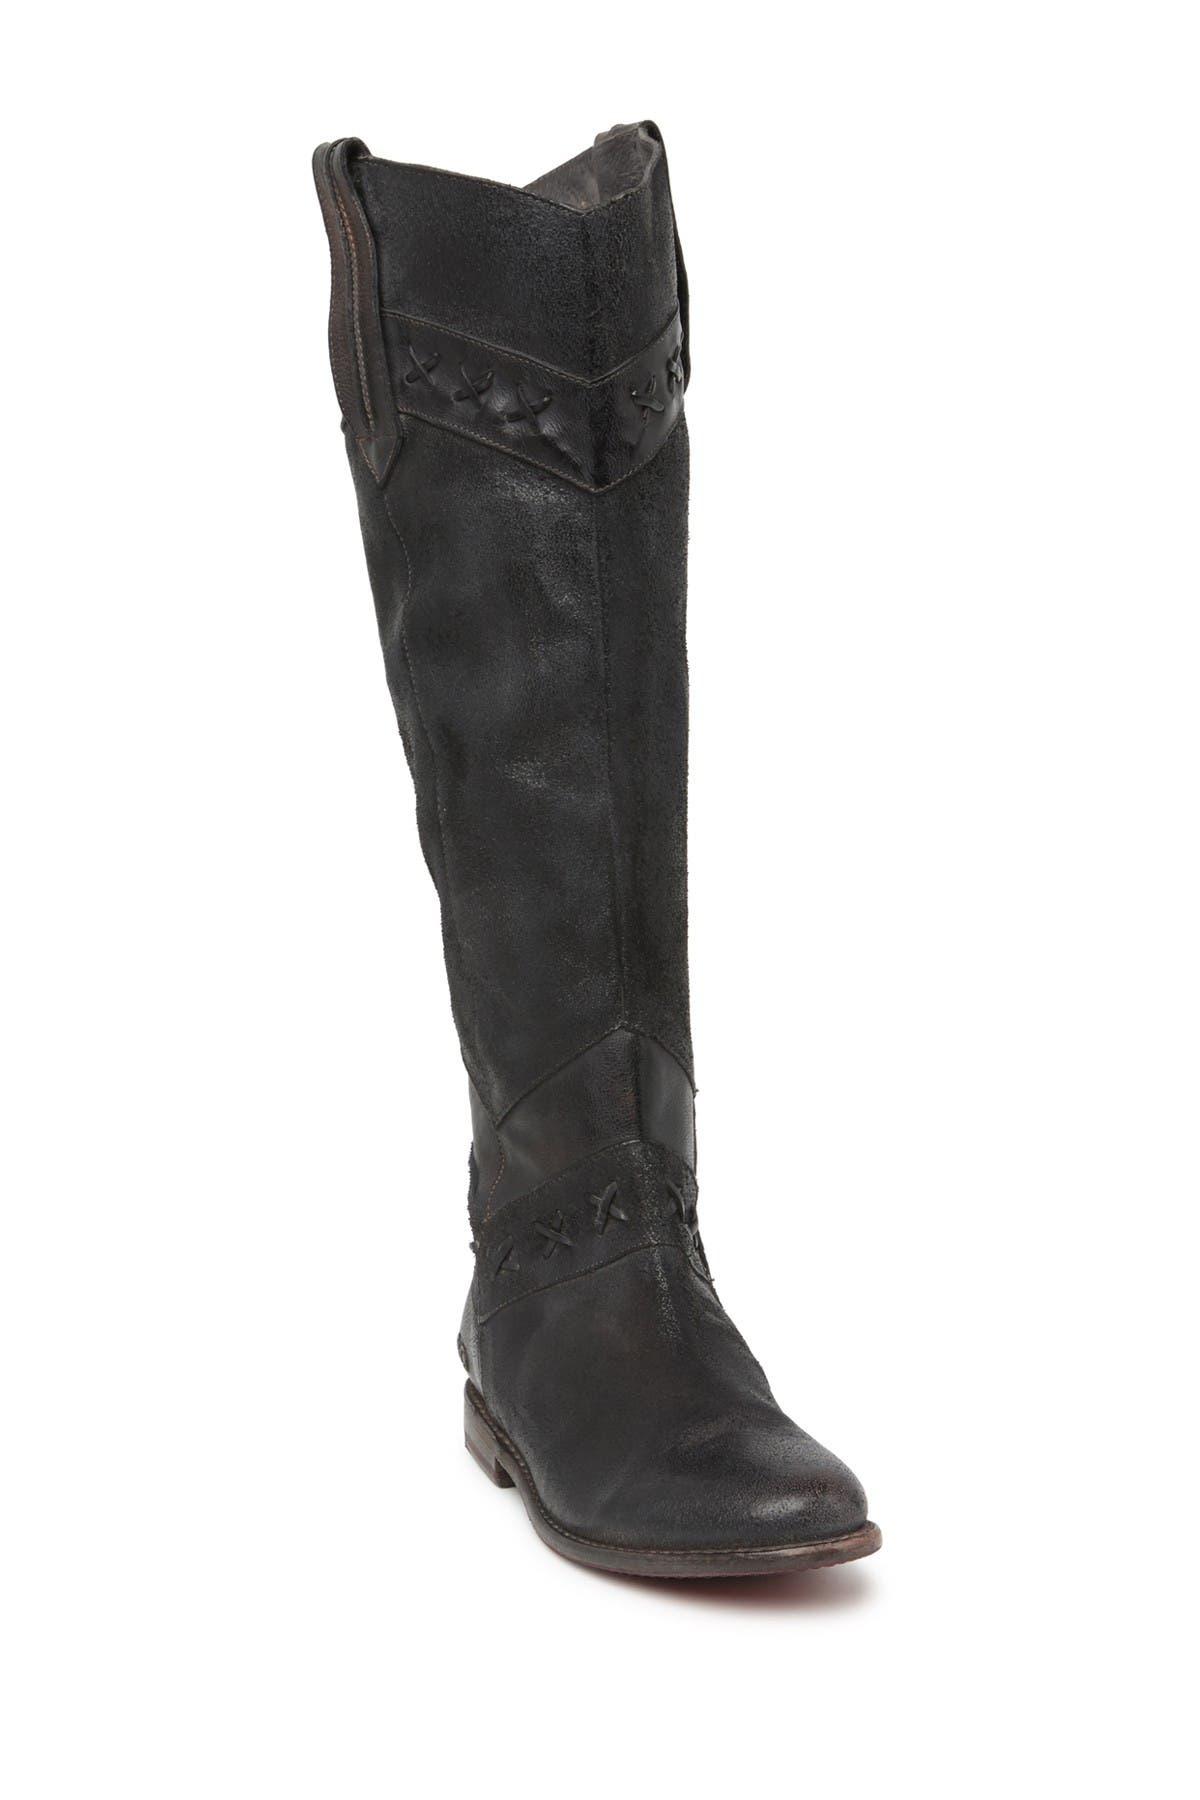 Image of Bed|Stu Midge Western Leather Boot